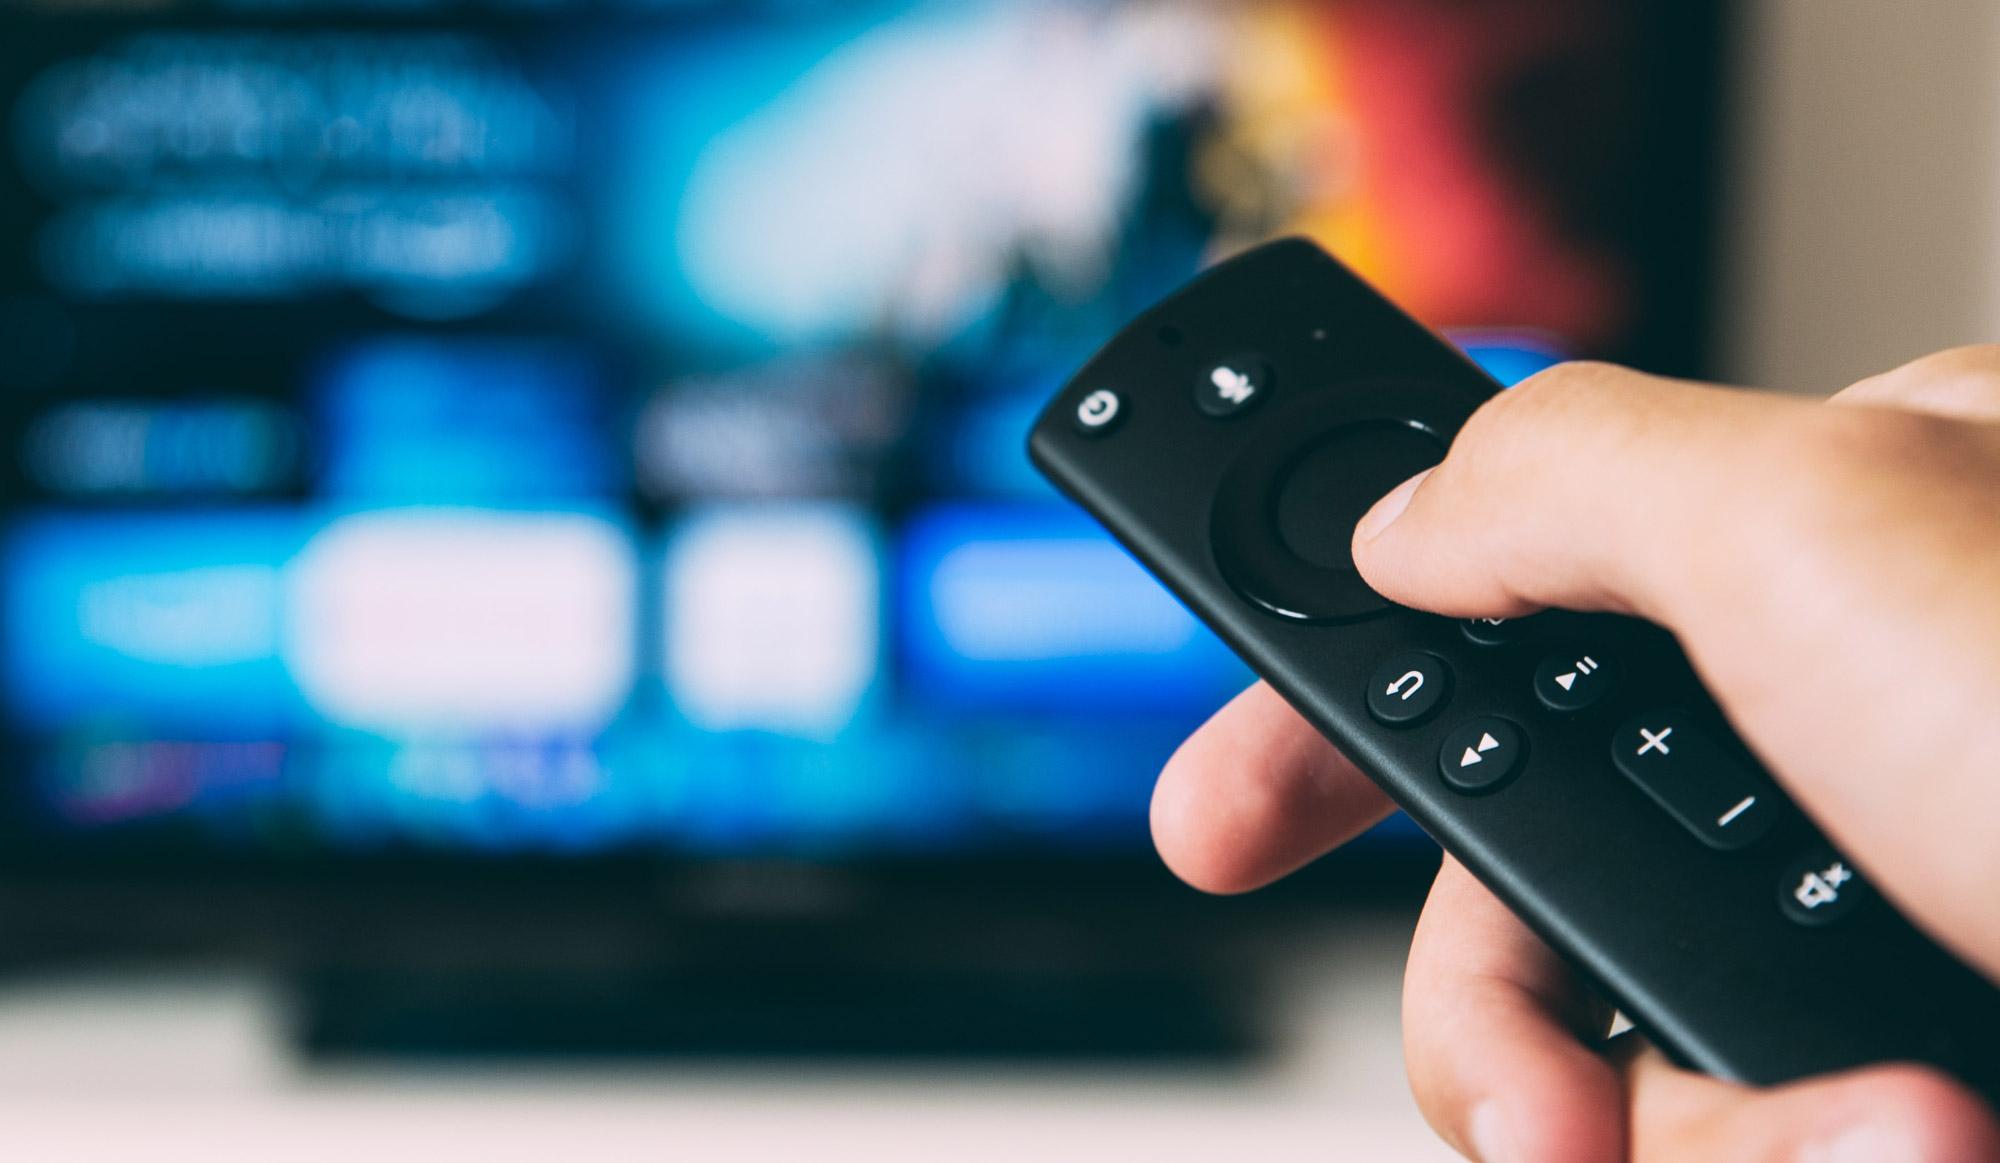 goedkoopste internet- en televisieabonnement